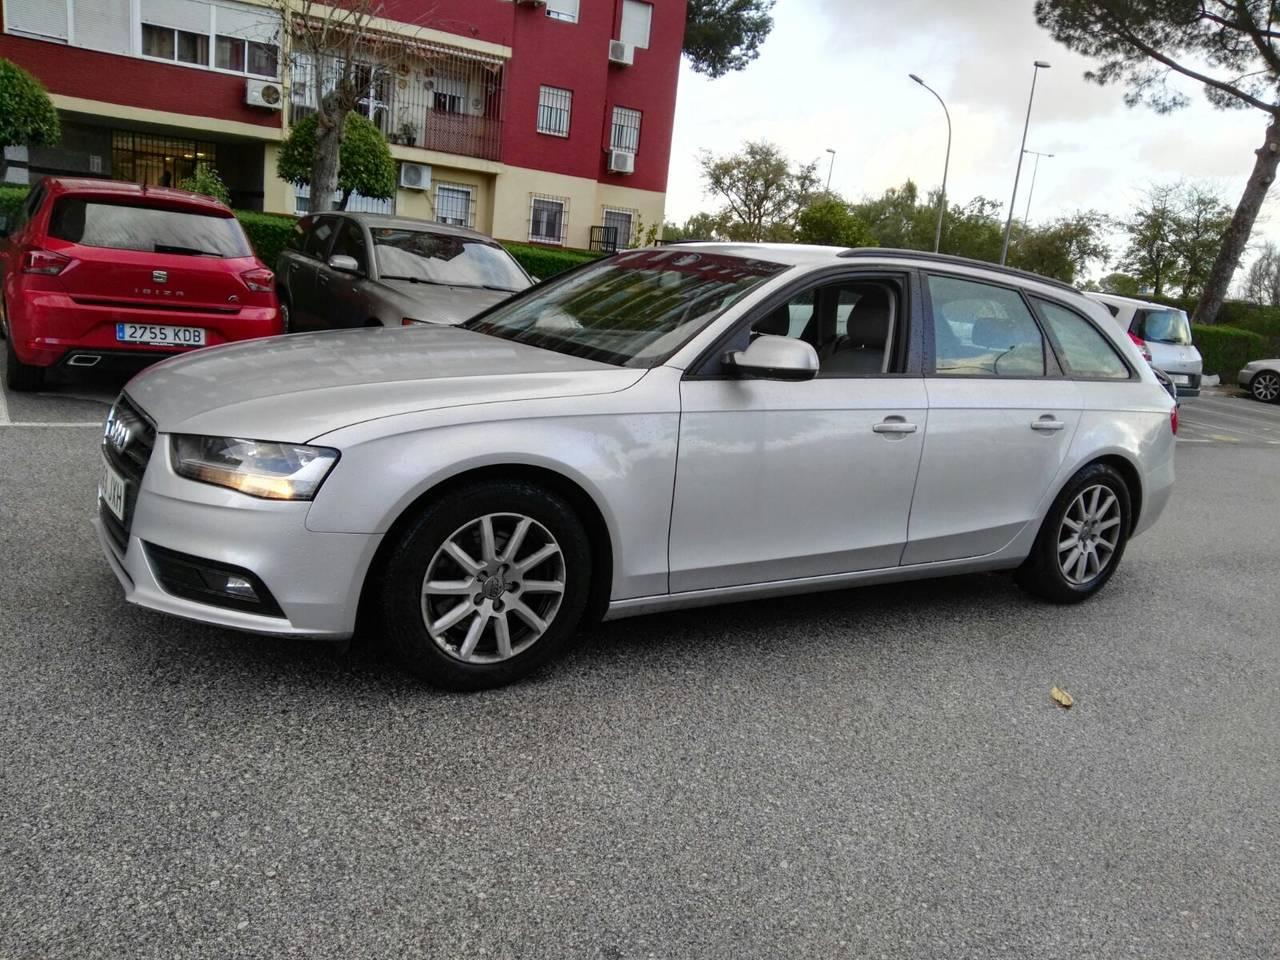 Audi A4 Avant 2.0 TDI 136cv...  - Foto 2